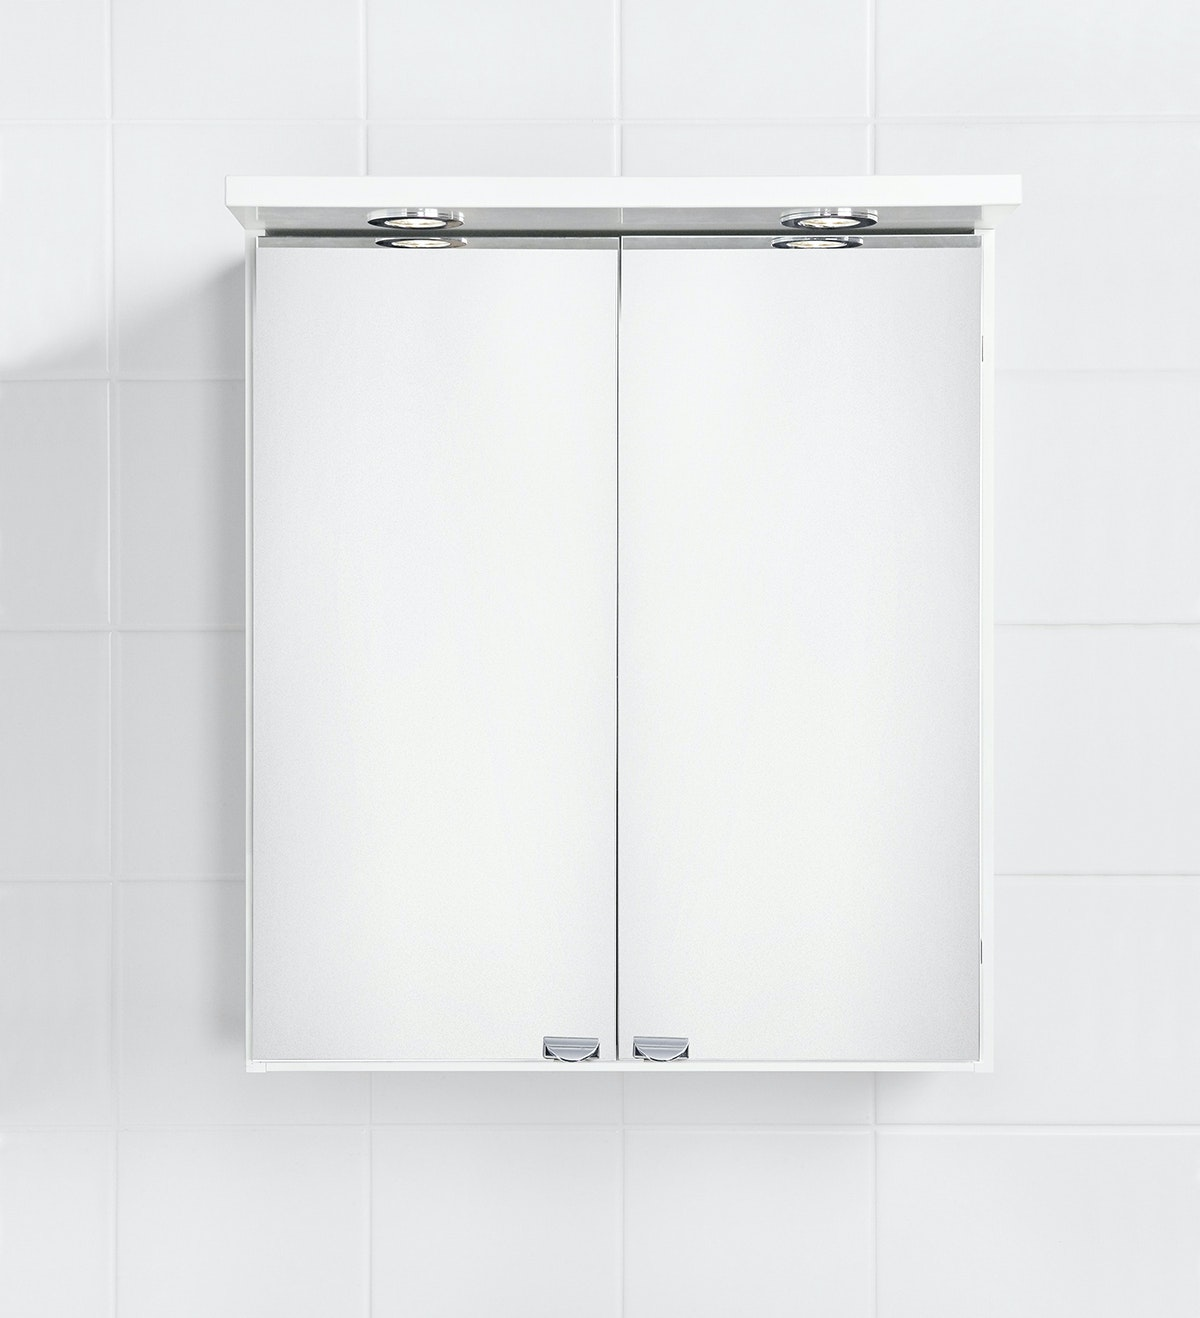 Spegelskåp Ido Renova 9342805001 Vit Halogenramp